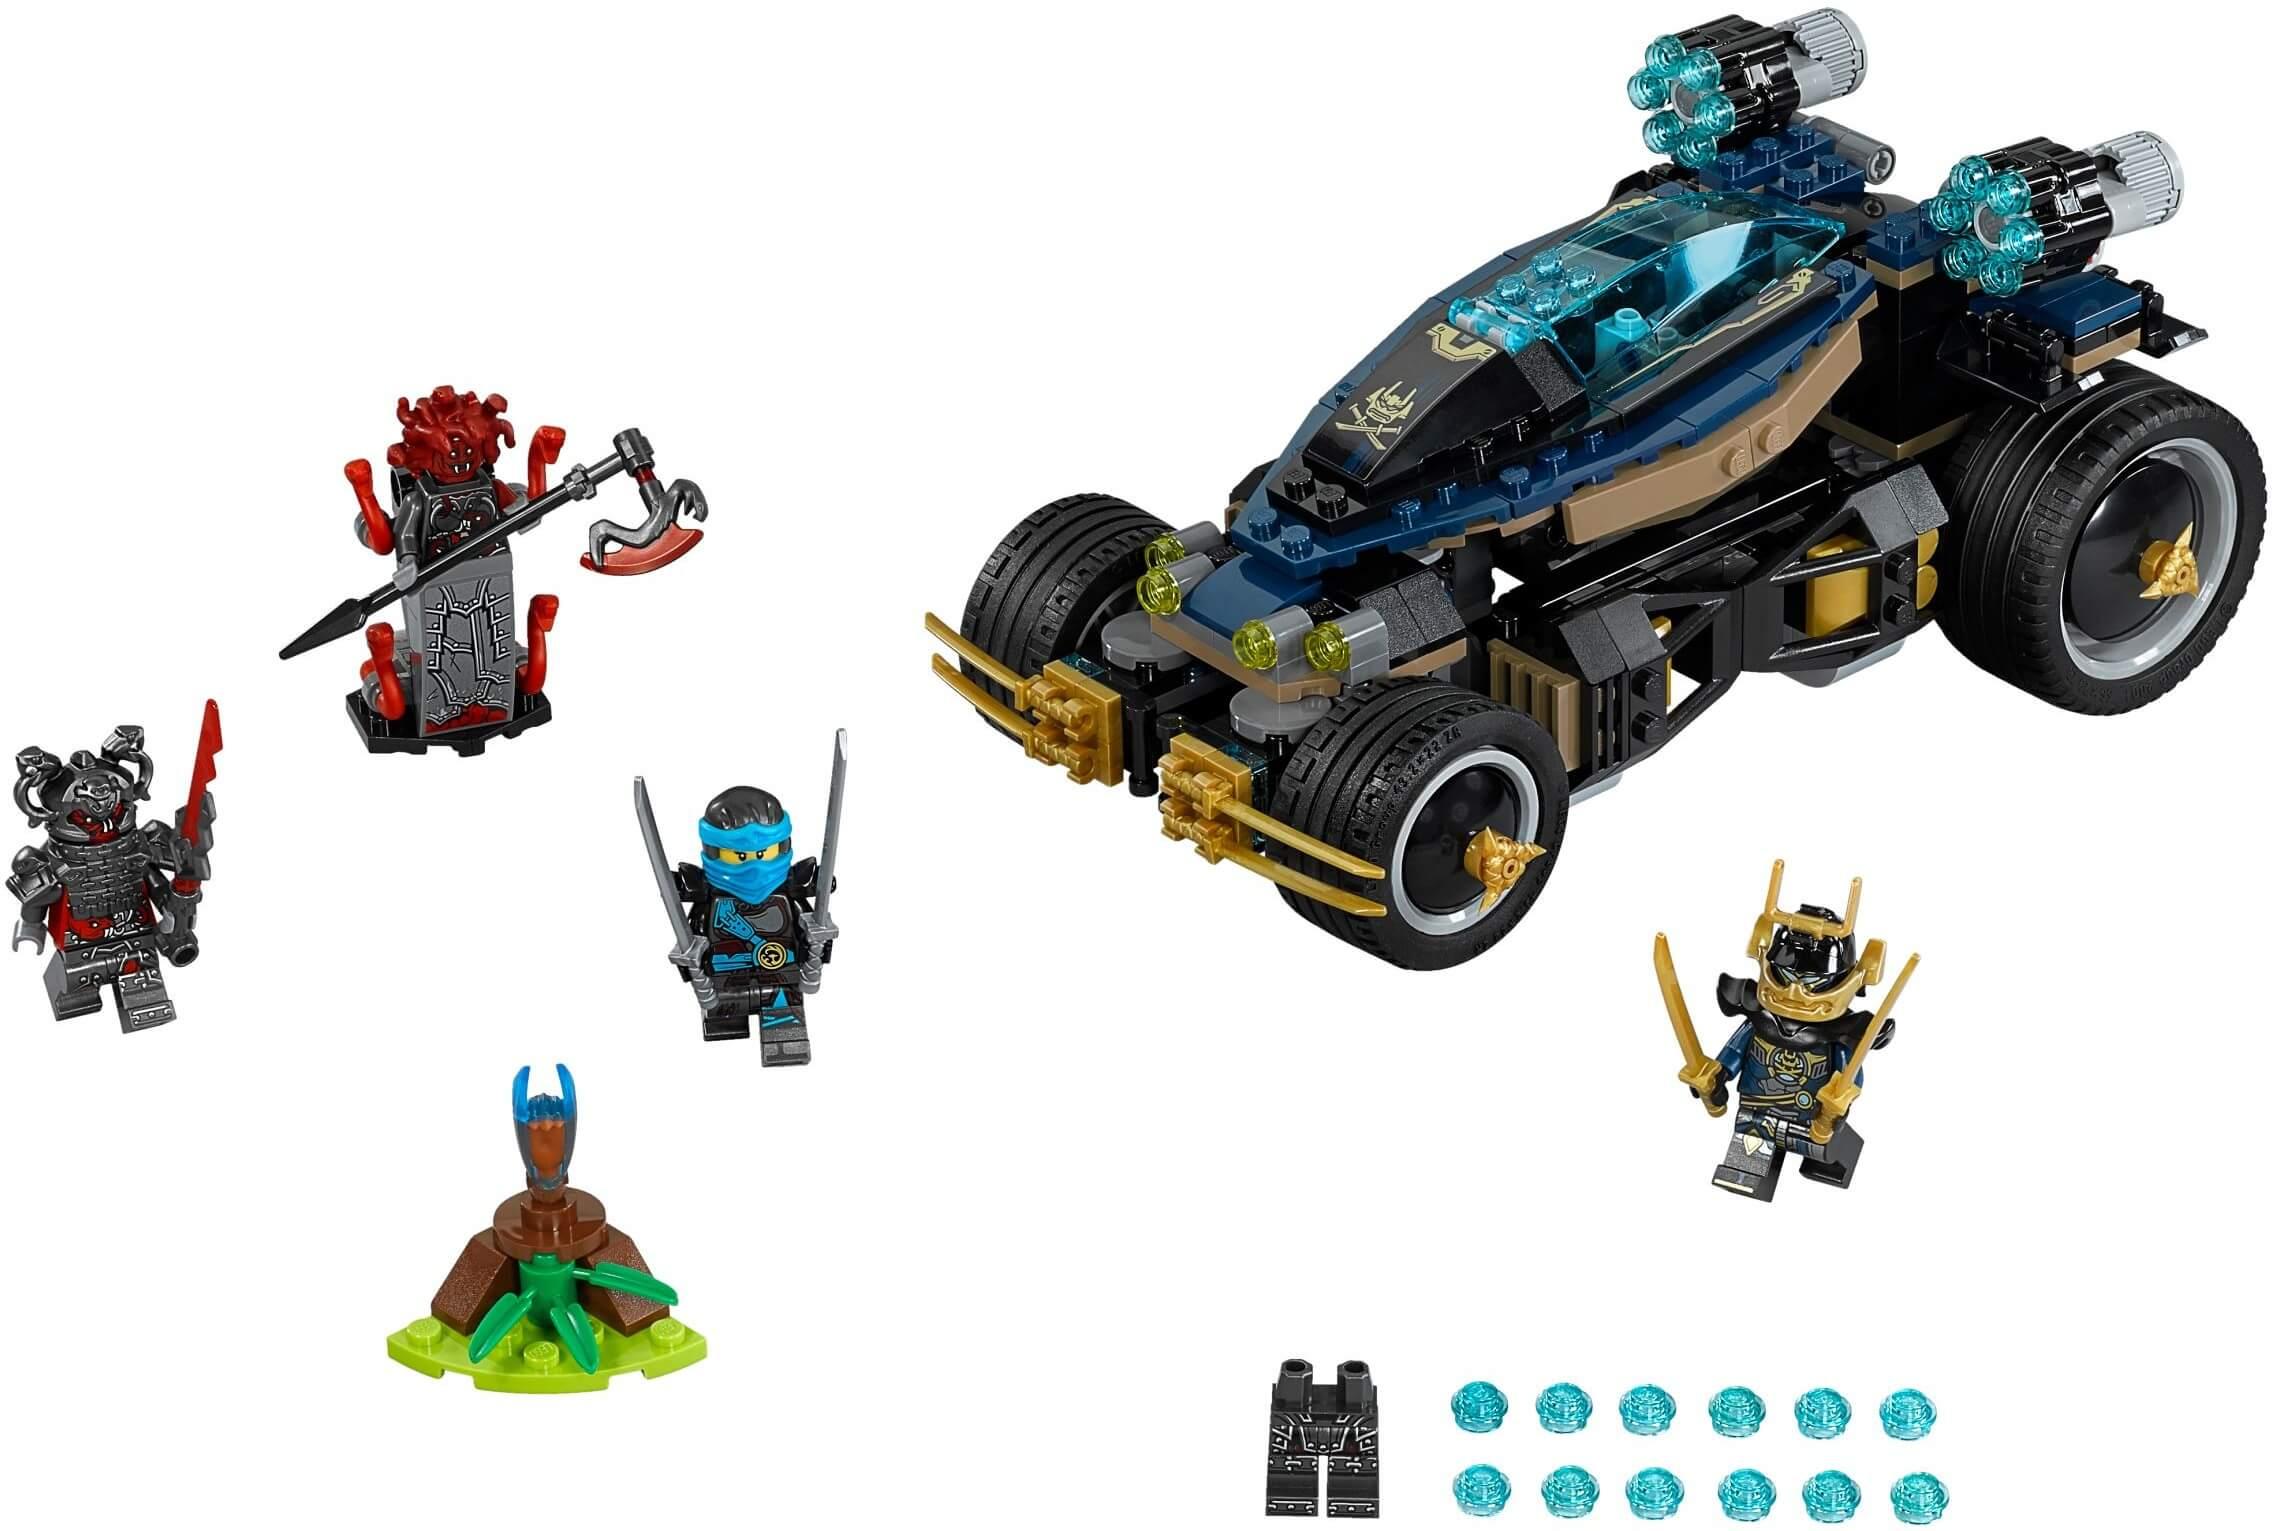 Mua đồ chơi LEGO 70625 - LEGO Ninjago 70625 - Siêu Xe Bọc Thép Samurai VXL (LEGO 70625 Samurai VXL)